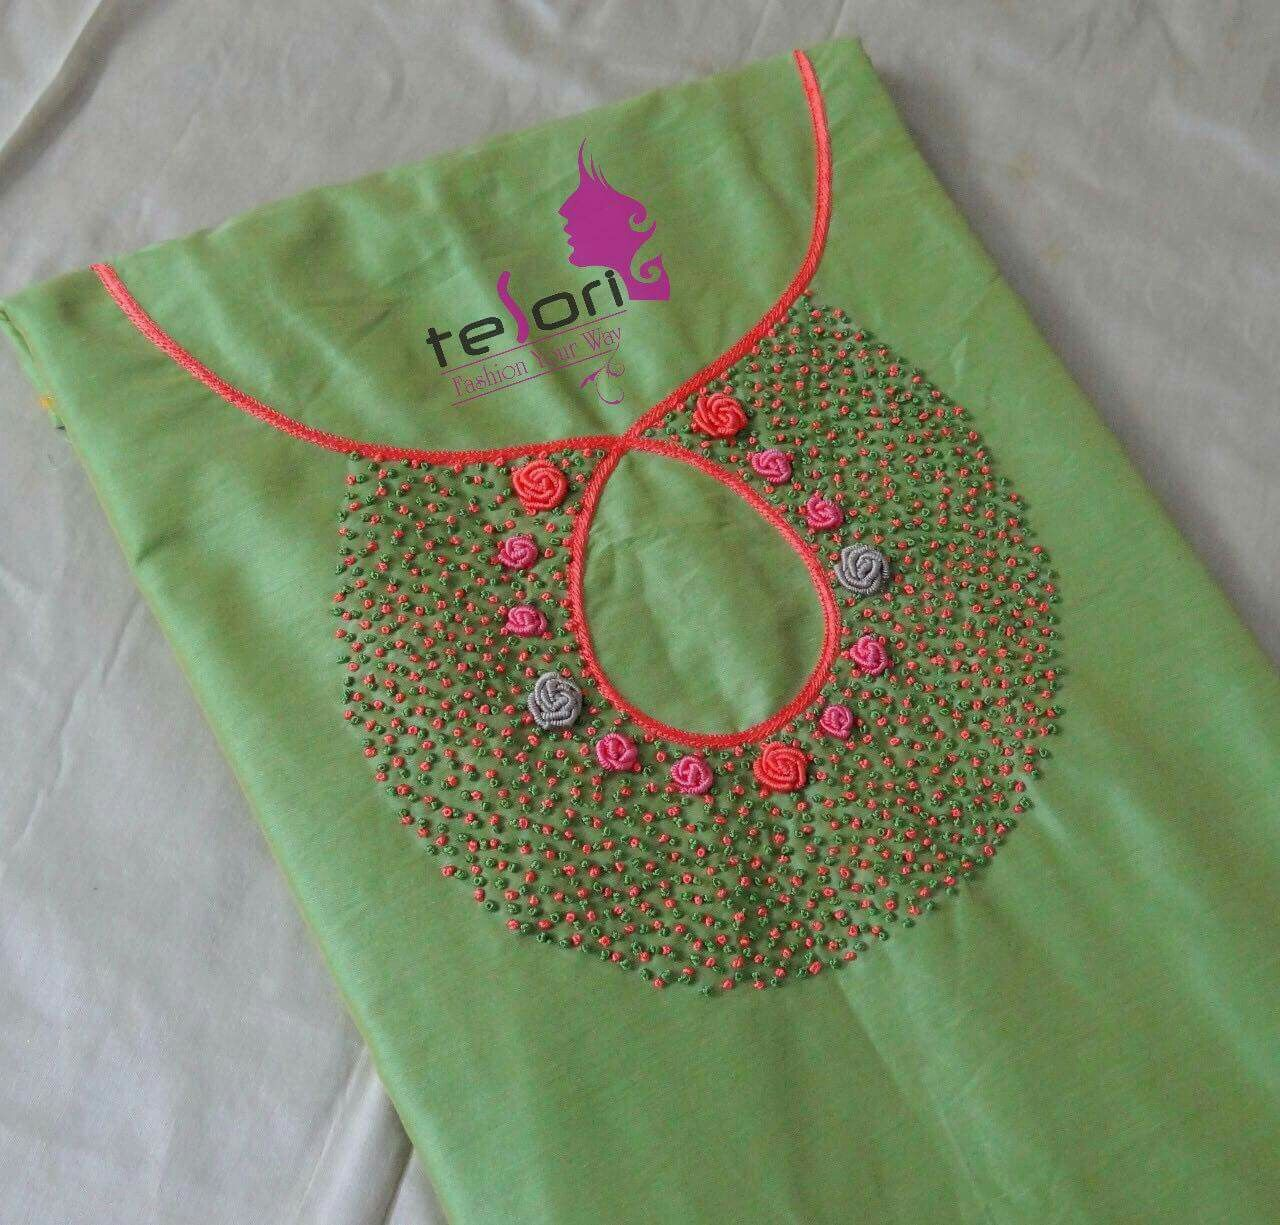 Pin de Anu Ahuja en blouse   Pinterest   Blusa bordada, Bordado y Blusas